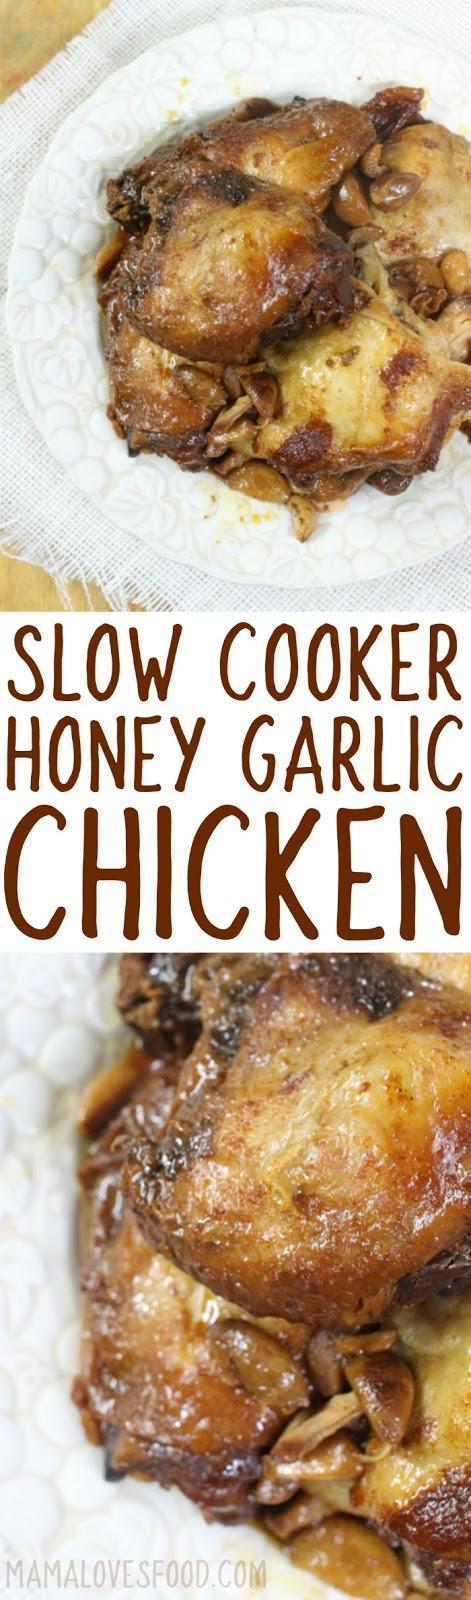 honey garlic crockpot chicken